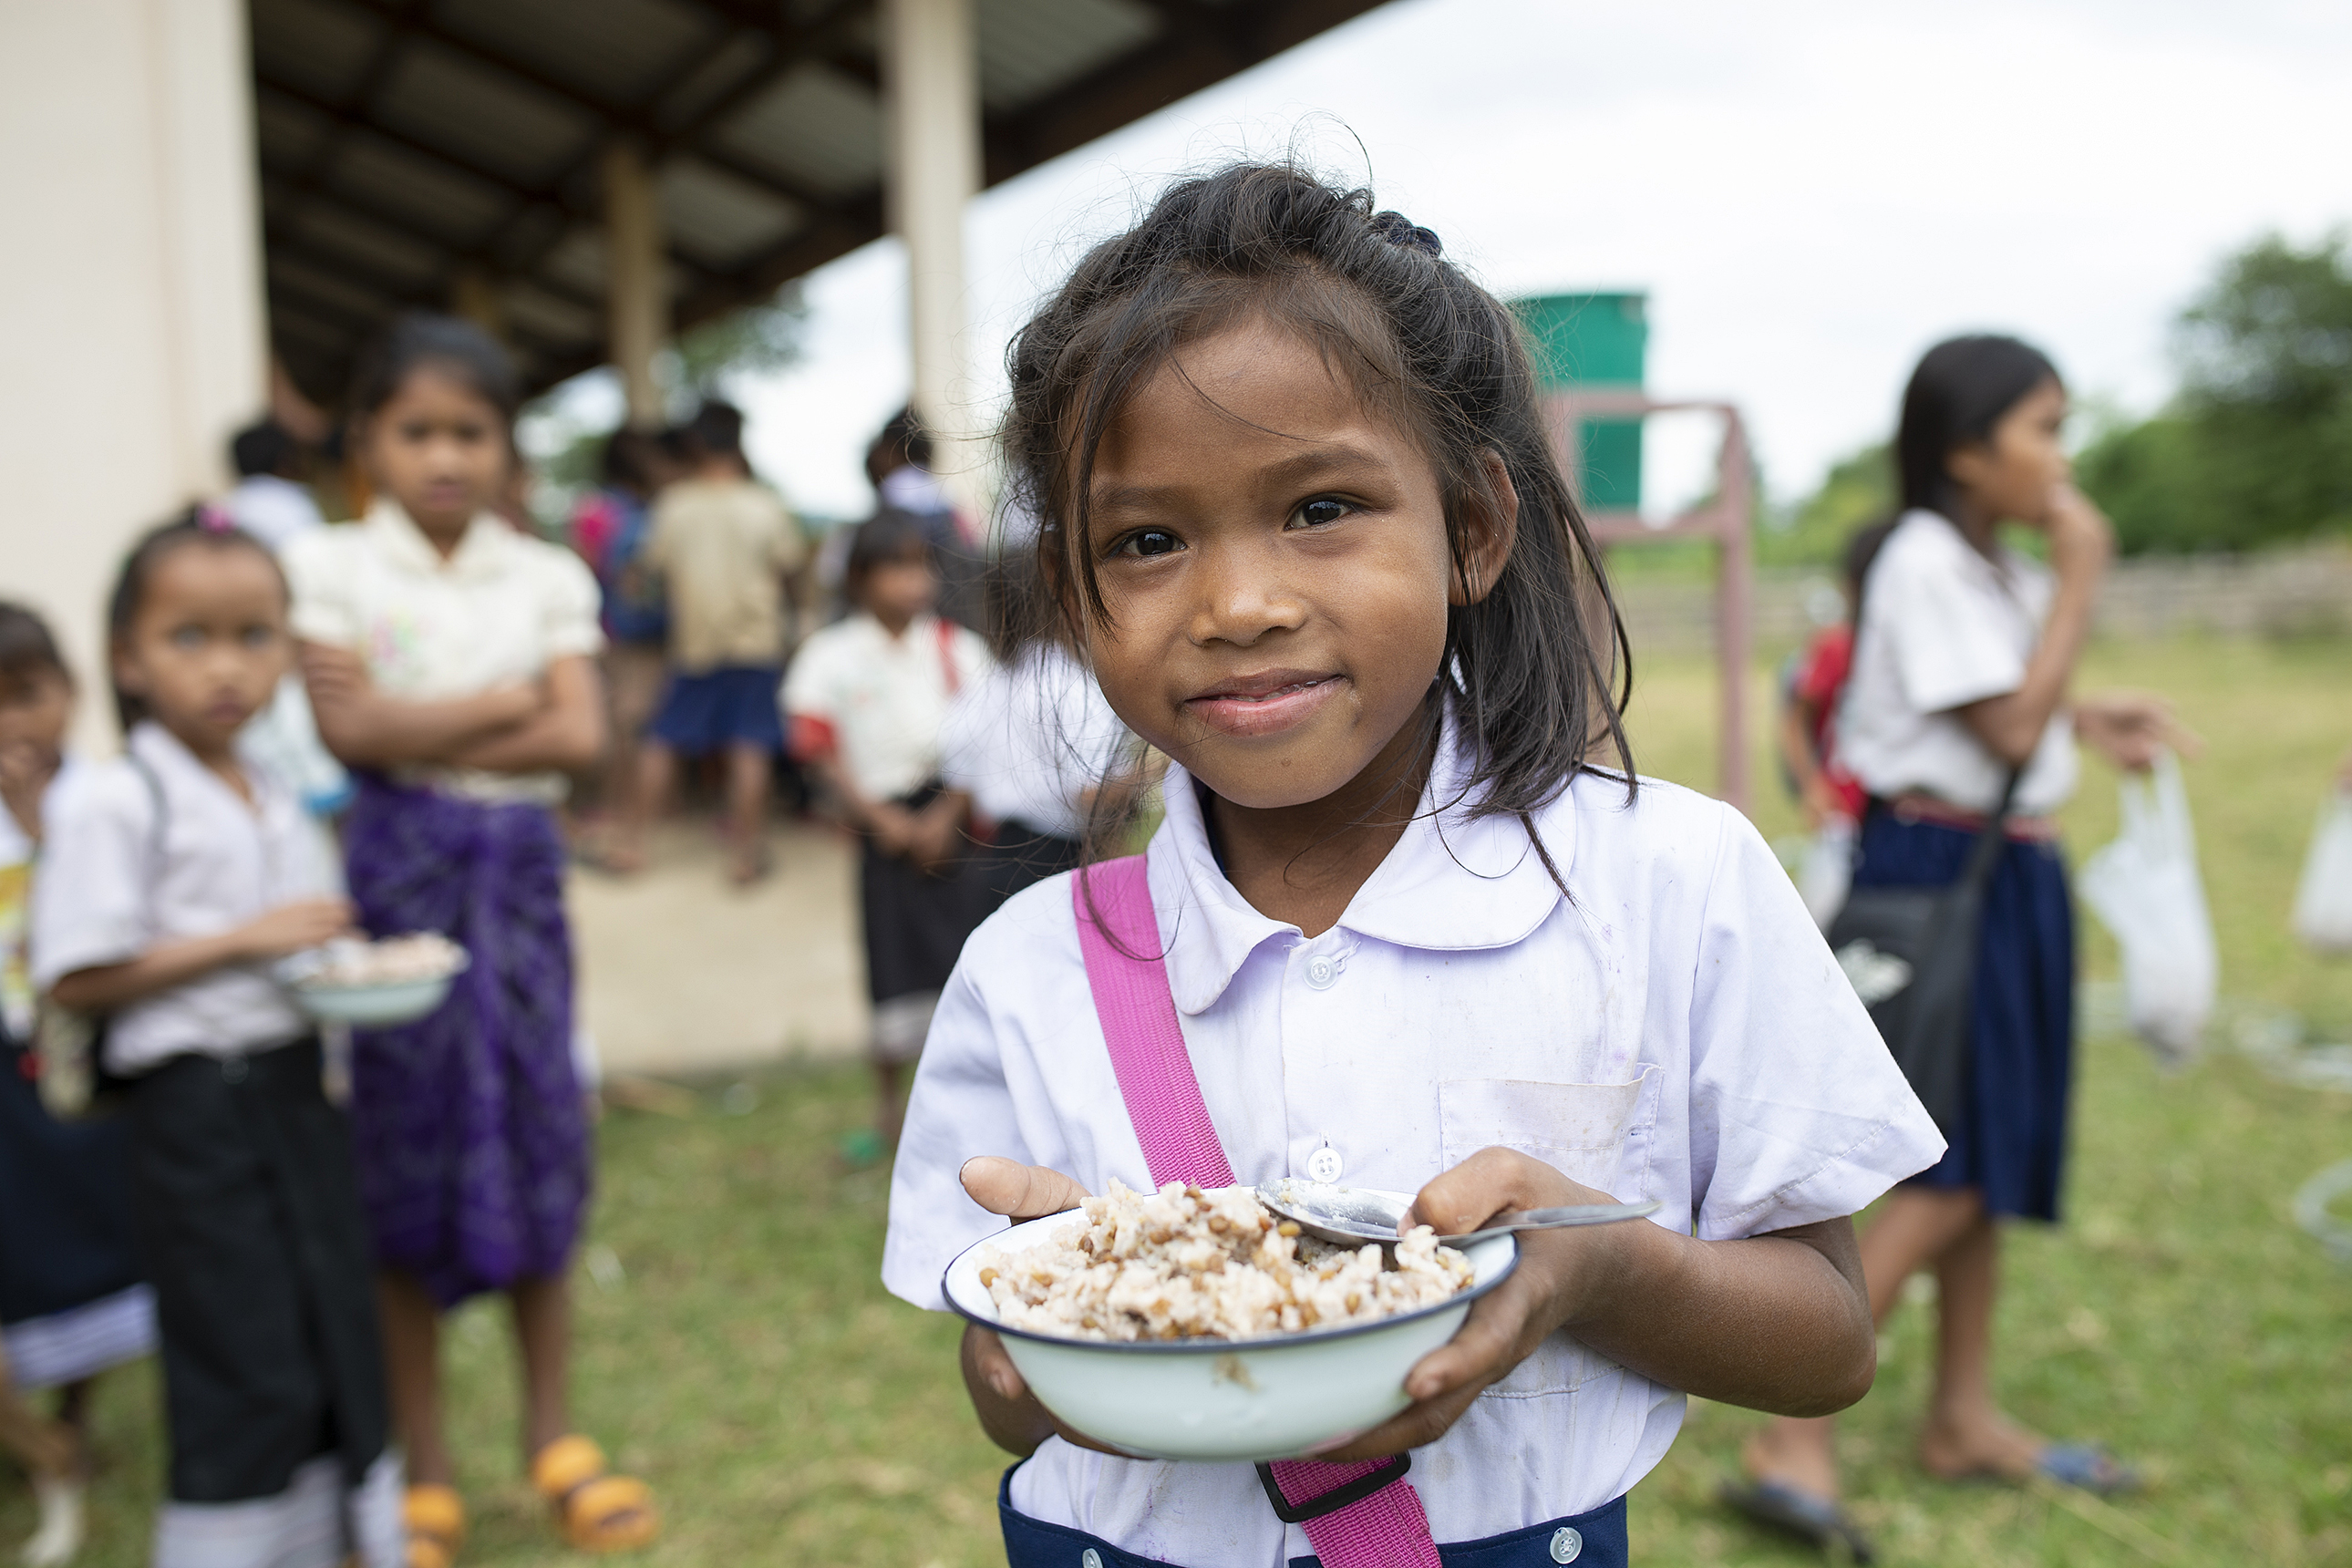 Children at school lunch in Laos